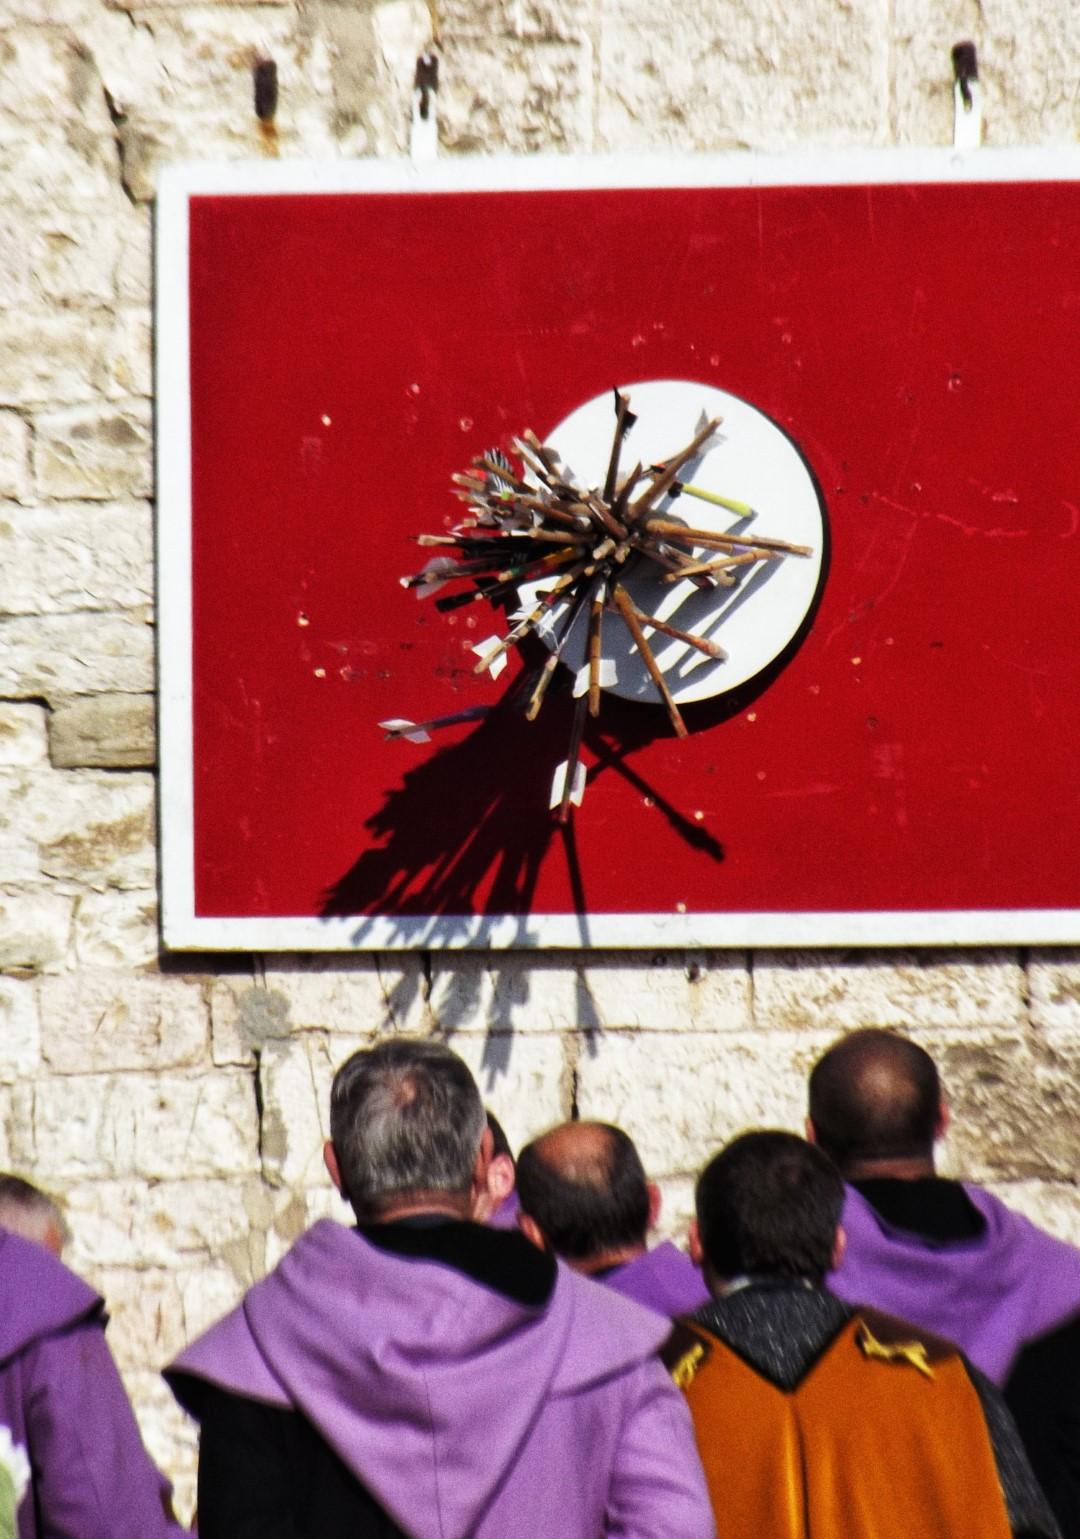 Men crowding around target full of arrows